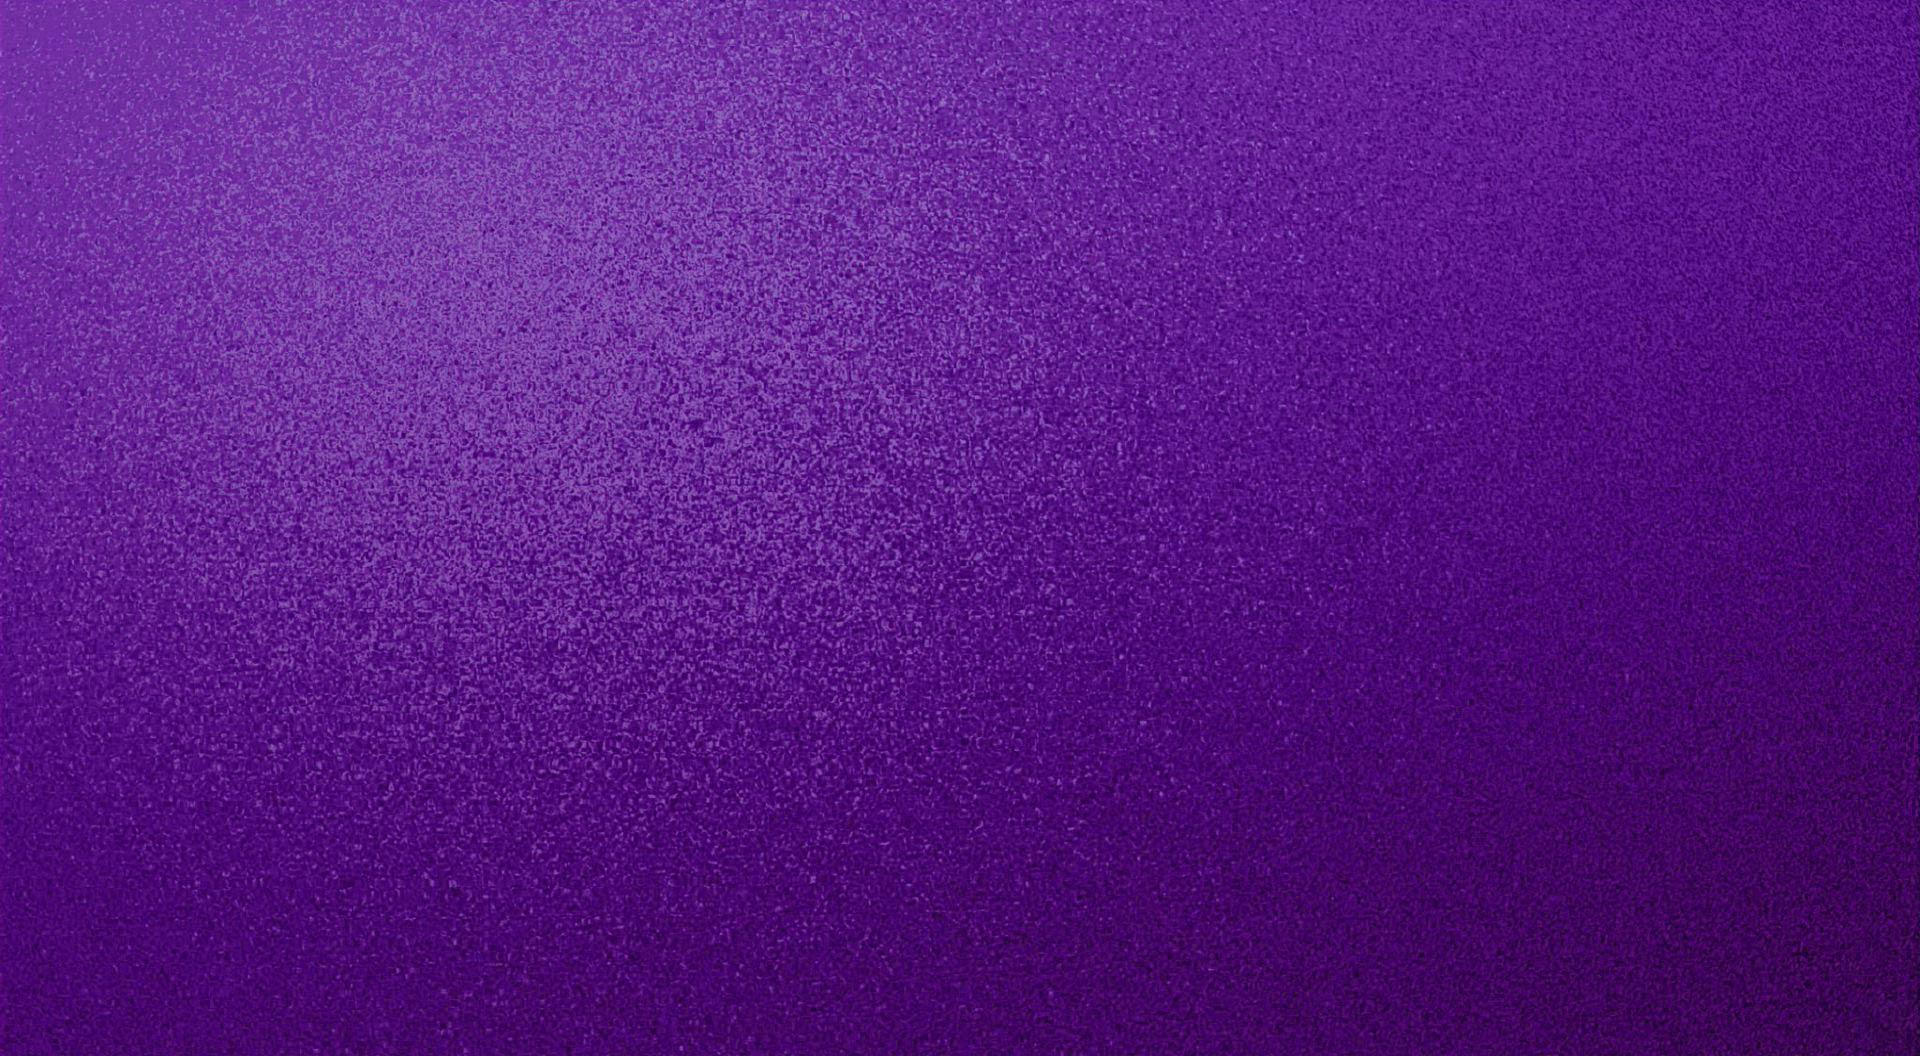 Violet Textured Background Desktop Wallpaper 1920x1056